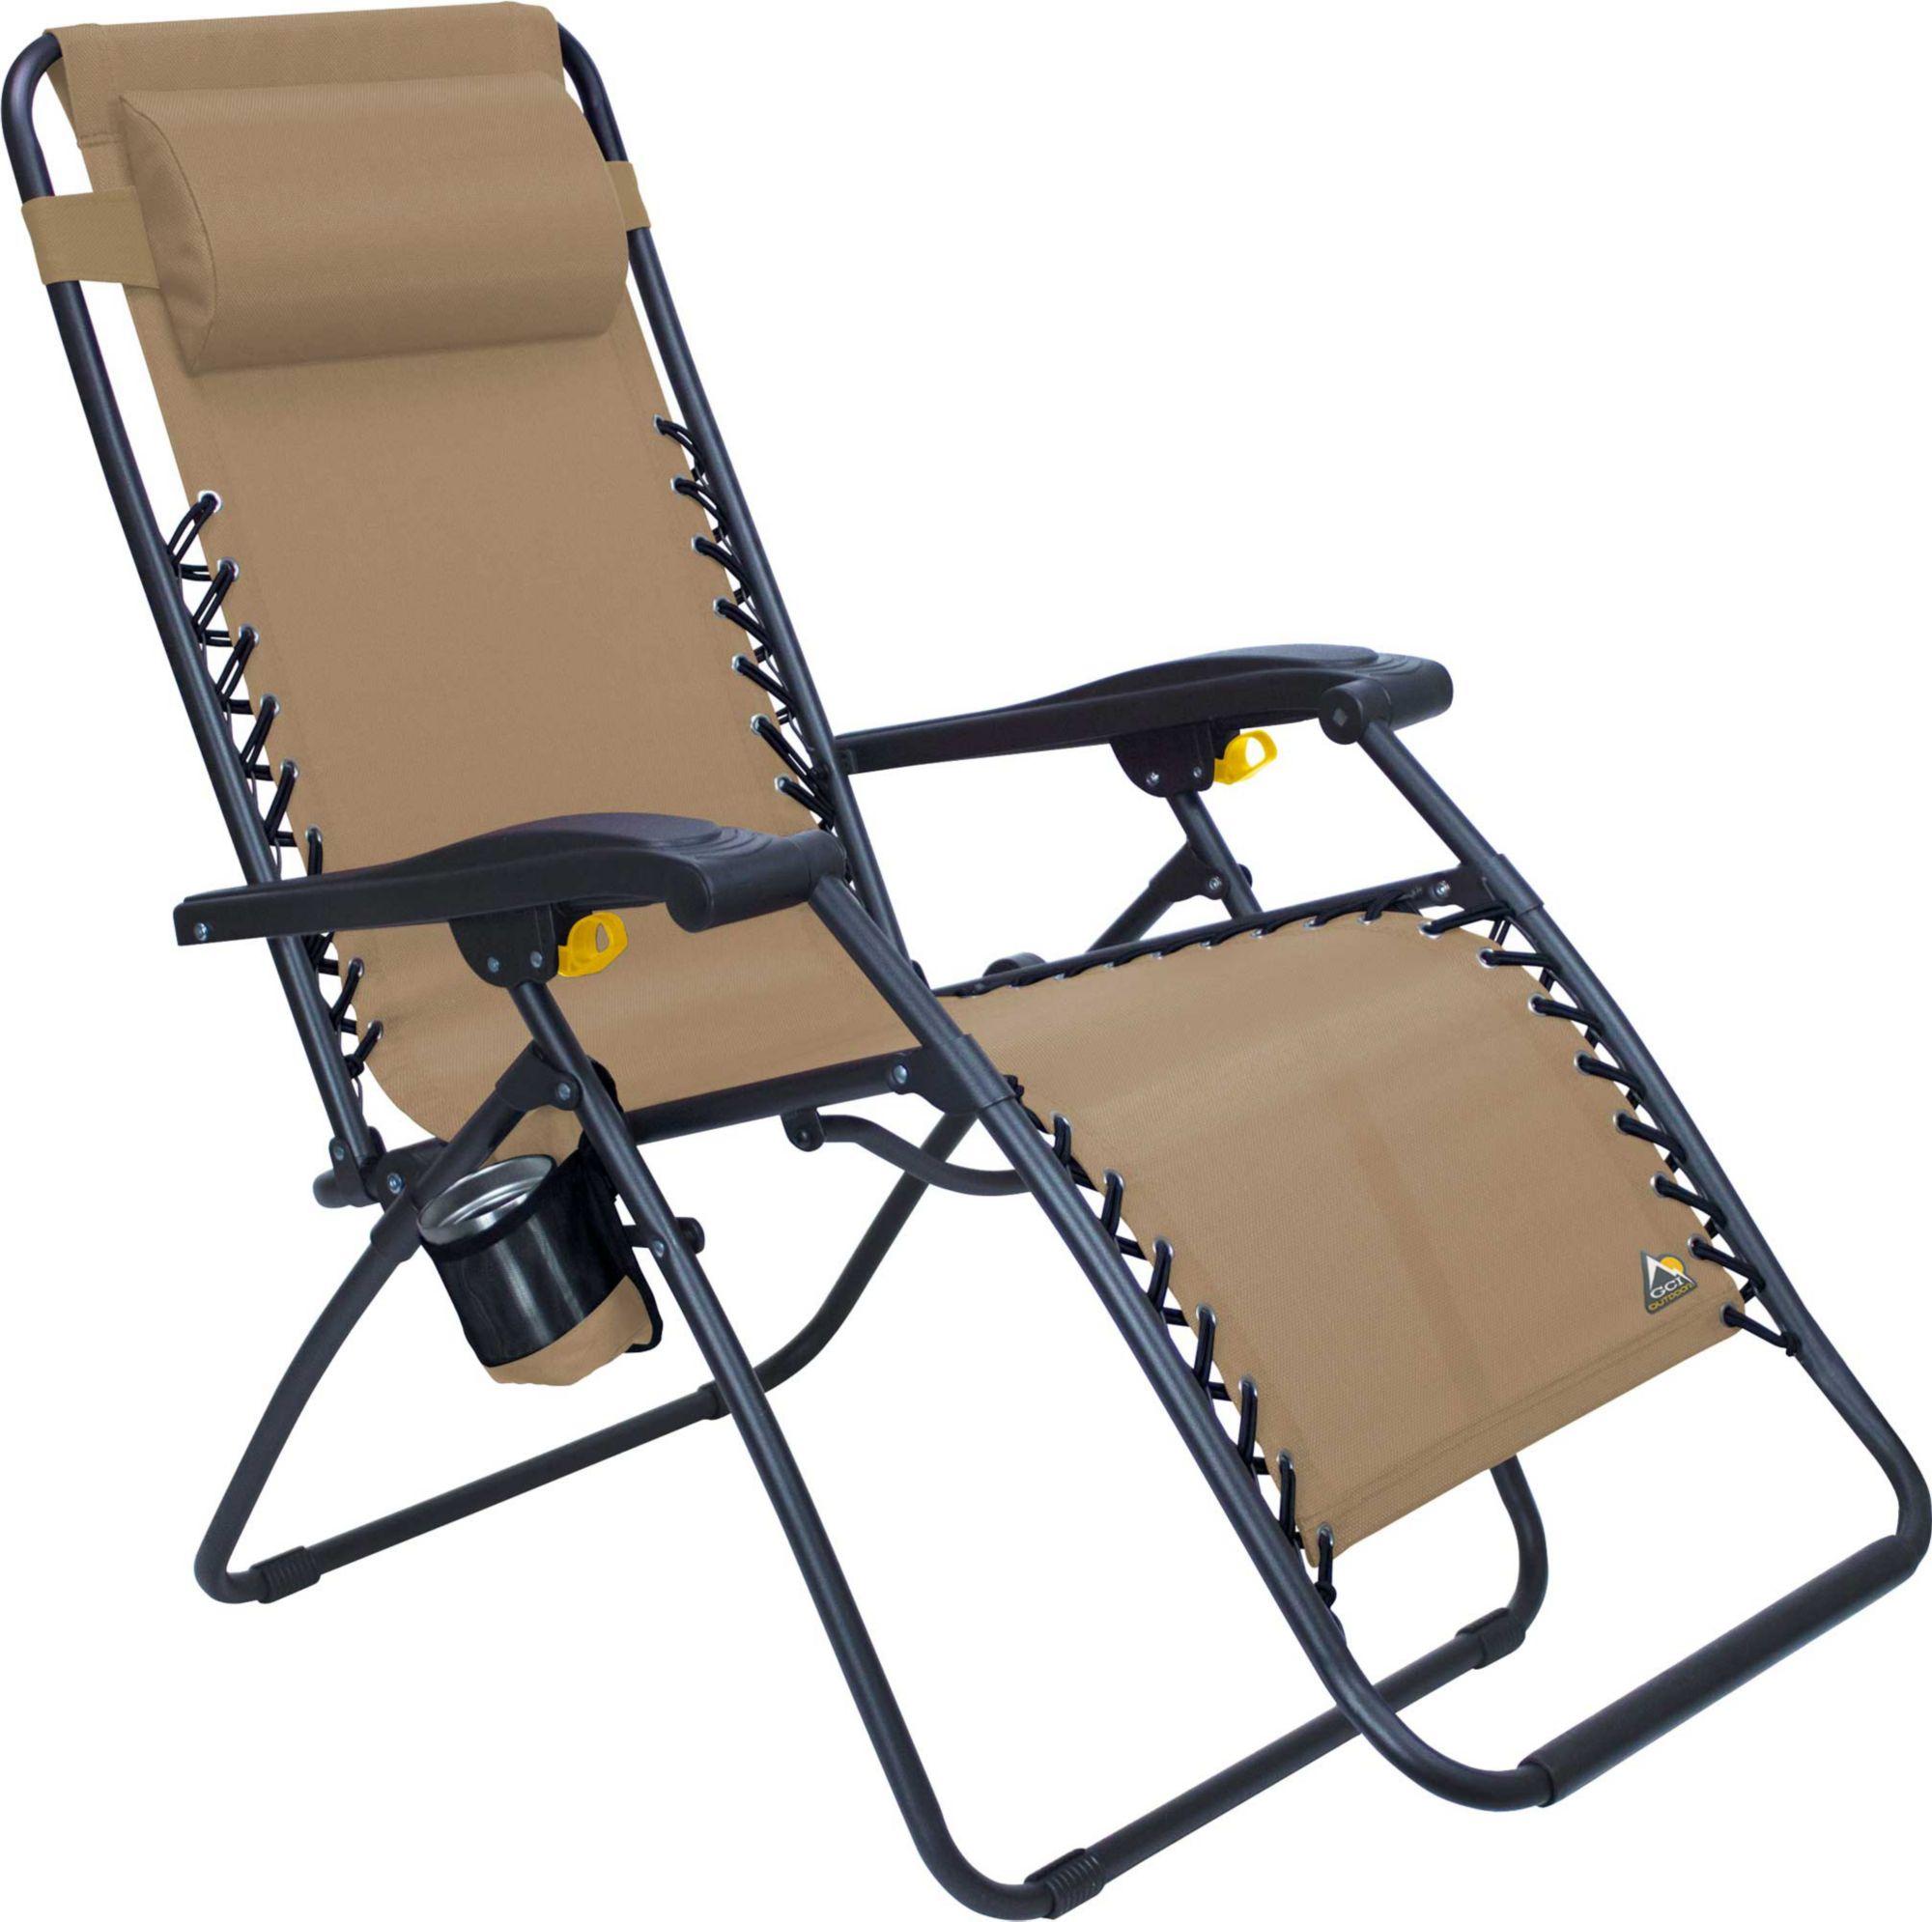 GCI Outdoor Zero Gravity Chair  sc 1 st  DICKu0027S Sporting Goods & GCI Outdoor Zero Gravity Chair   DICKu0027S Sporting Goods